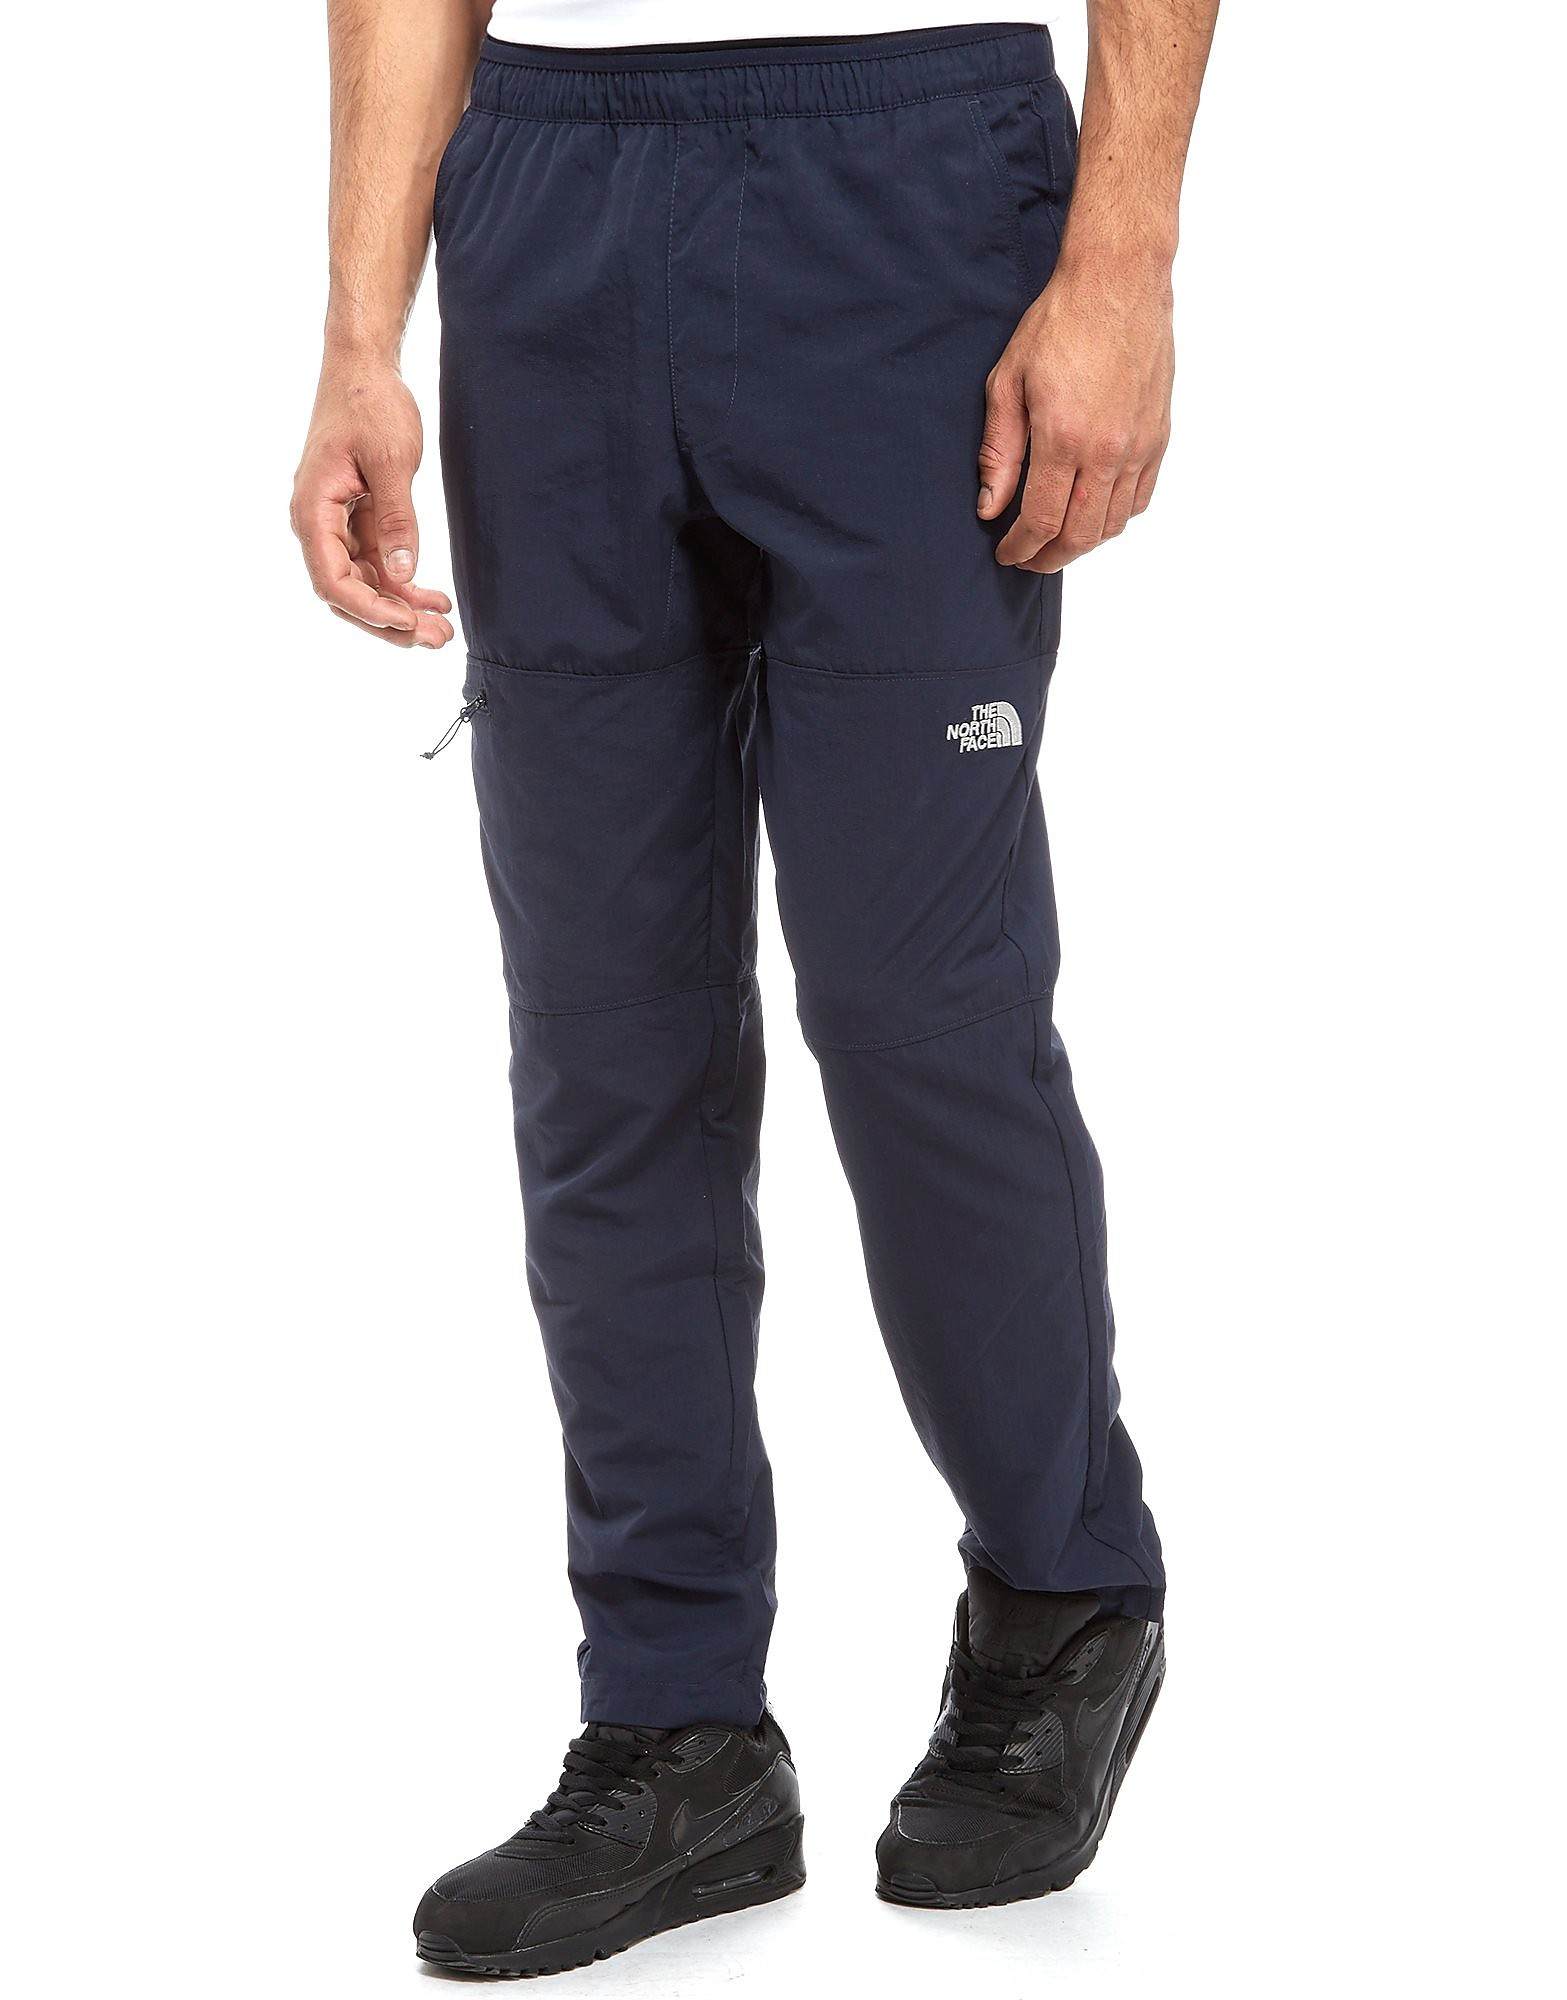 The North Face pantalon Z-Pocket Cargo - Only at JD - Navy, Navy